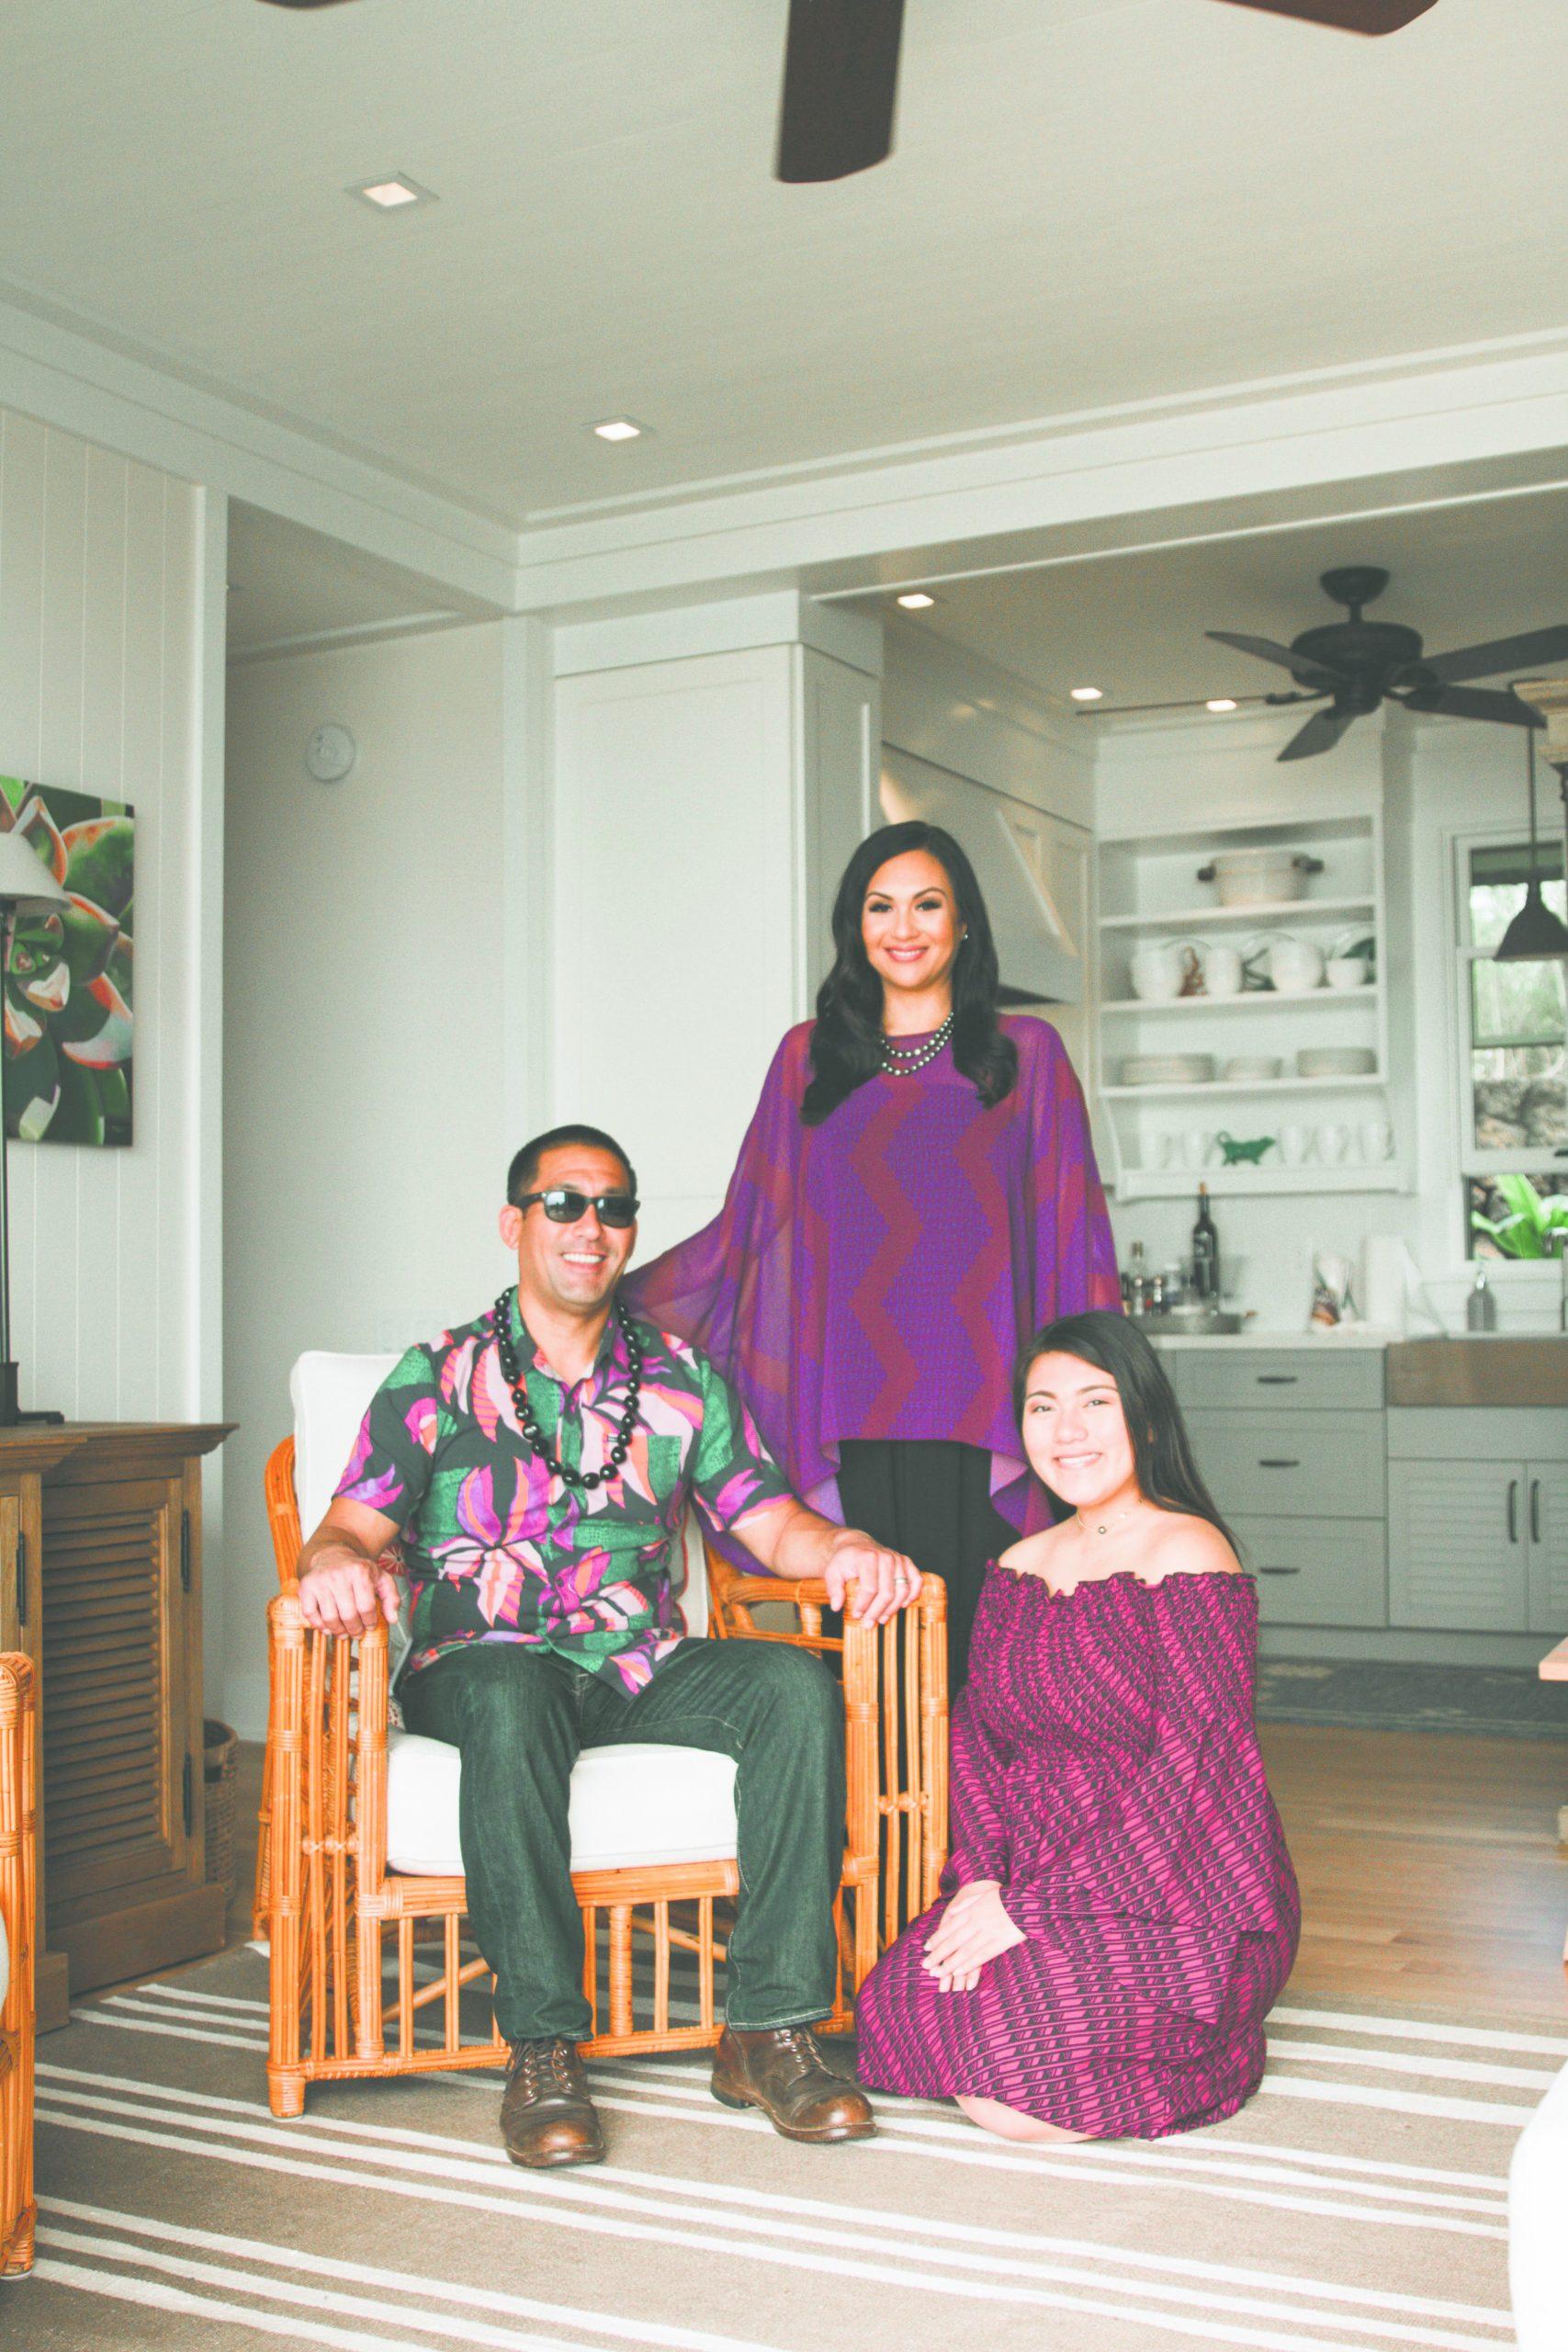 Mayor Kawakami with his wife Monica and their daughter Hailee. (Photo courtesy Monica Kawakami)